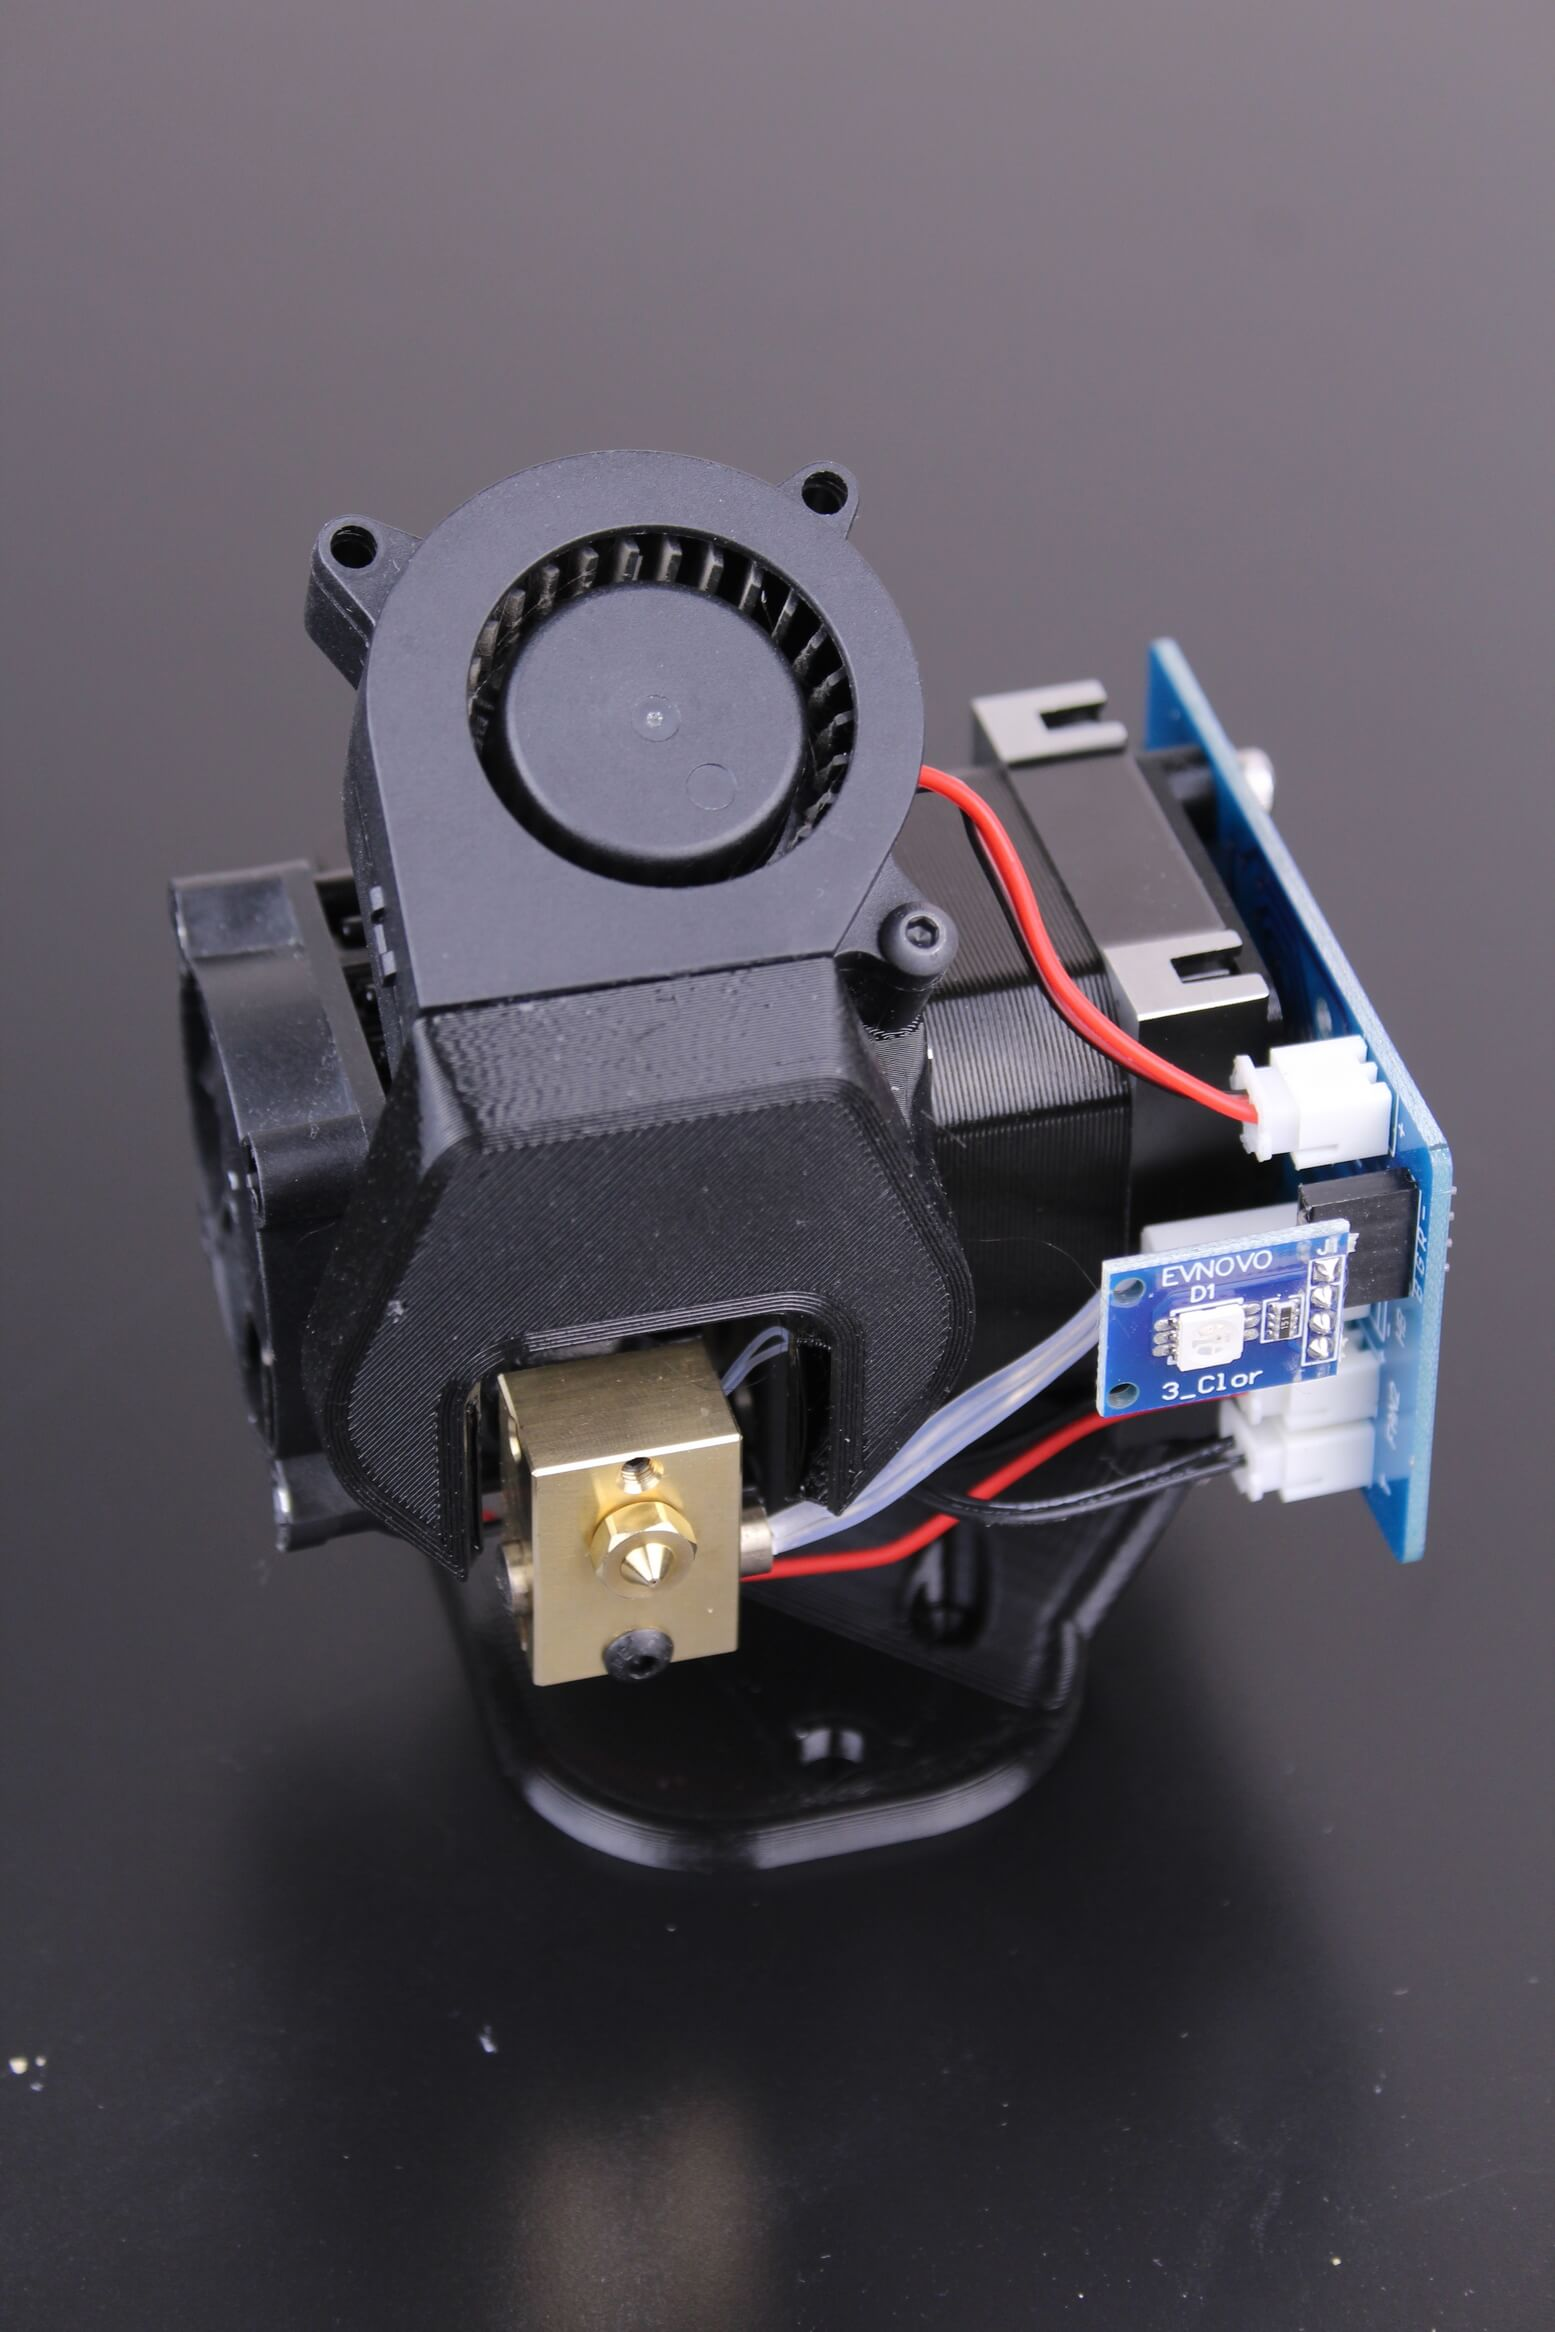 Trianglelab-Matrix-Extruder-assembled-for-the-Artillery-3D-printer-2